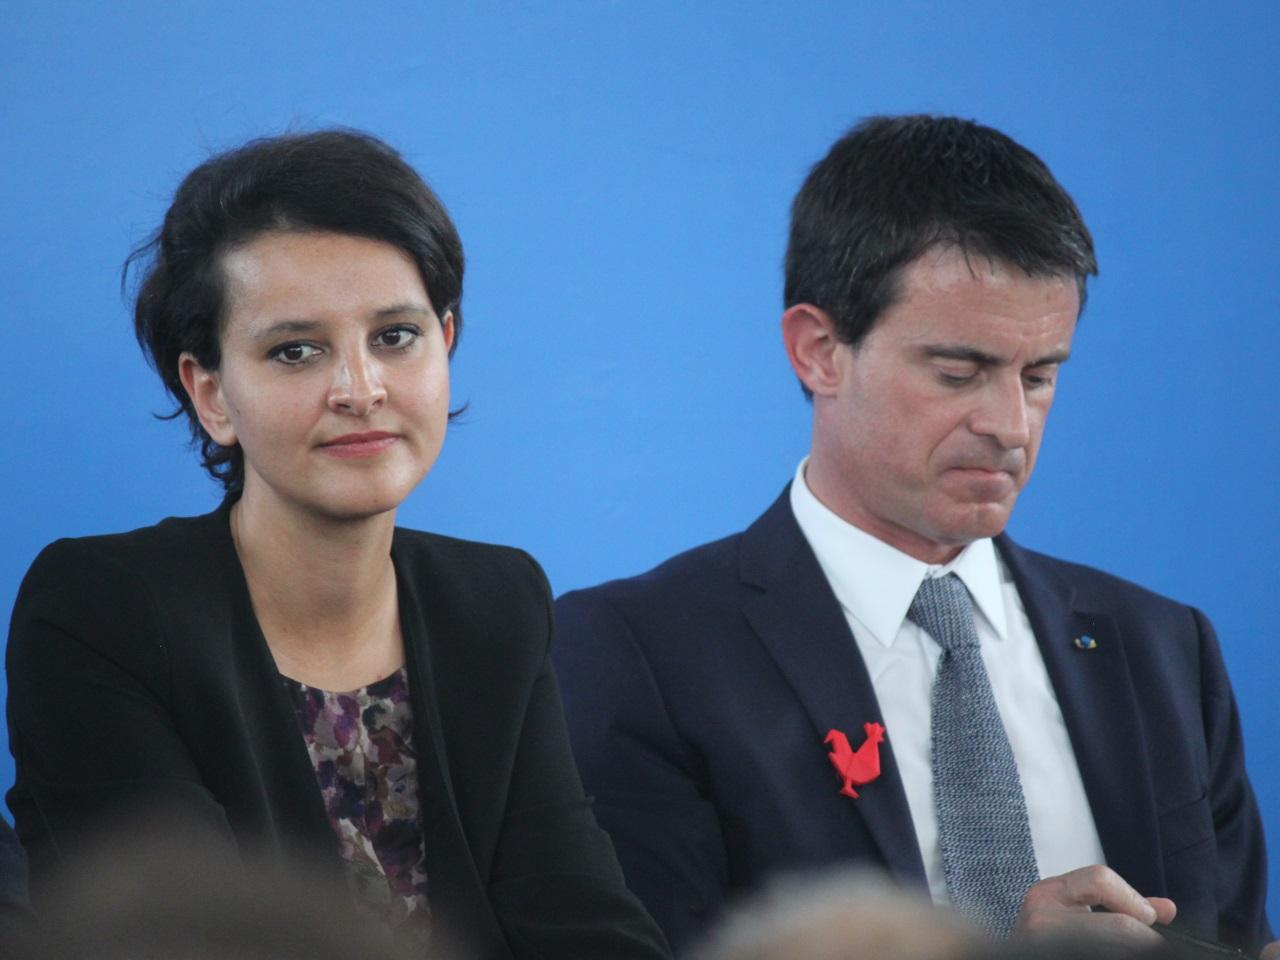 Primaire à gauche: Najat Vallaud-Belkacem soutient Manuel Valls